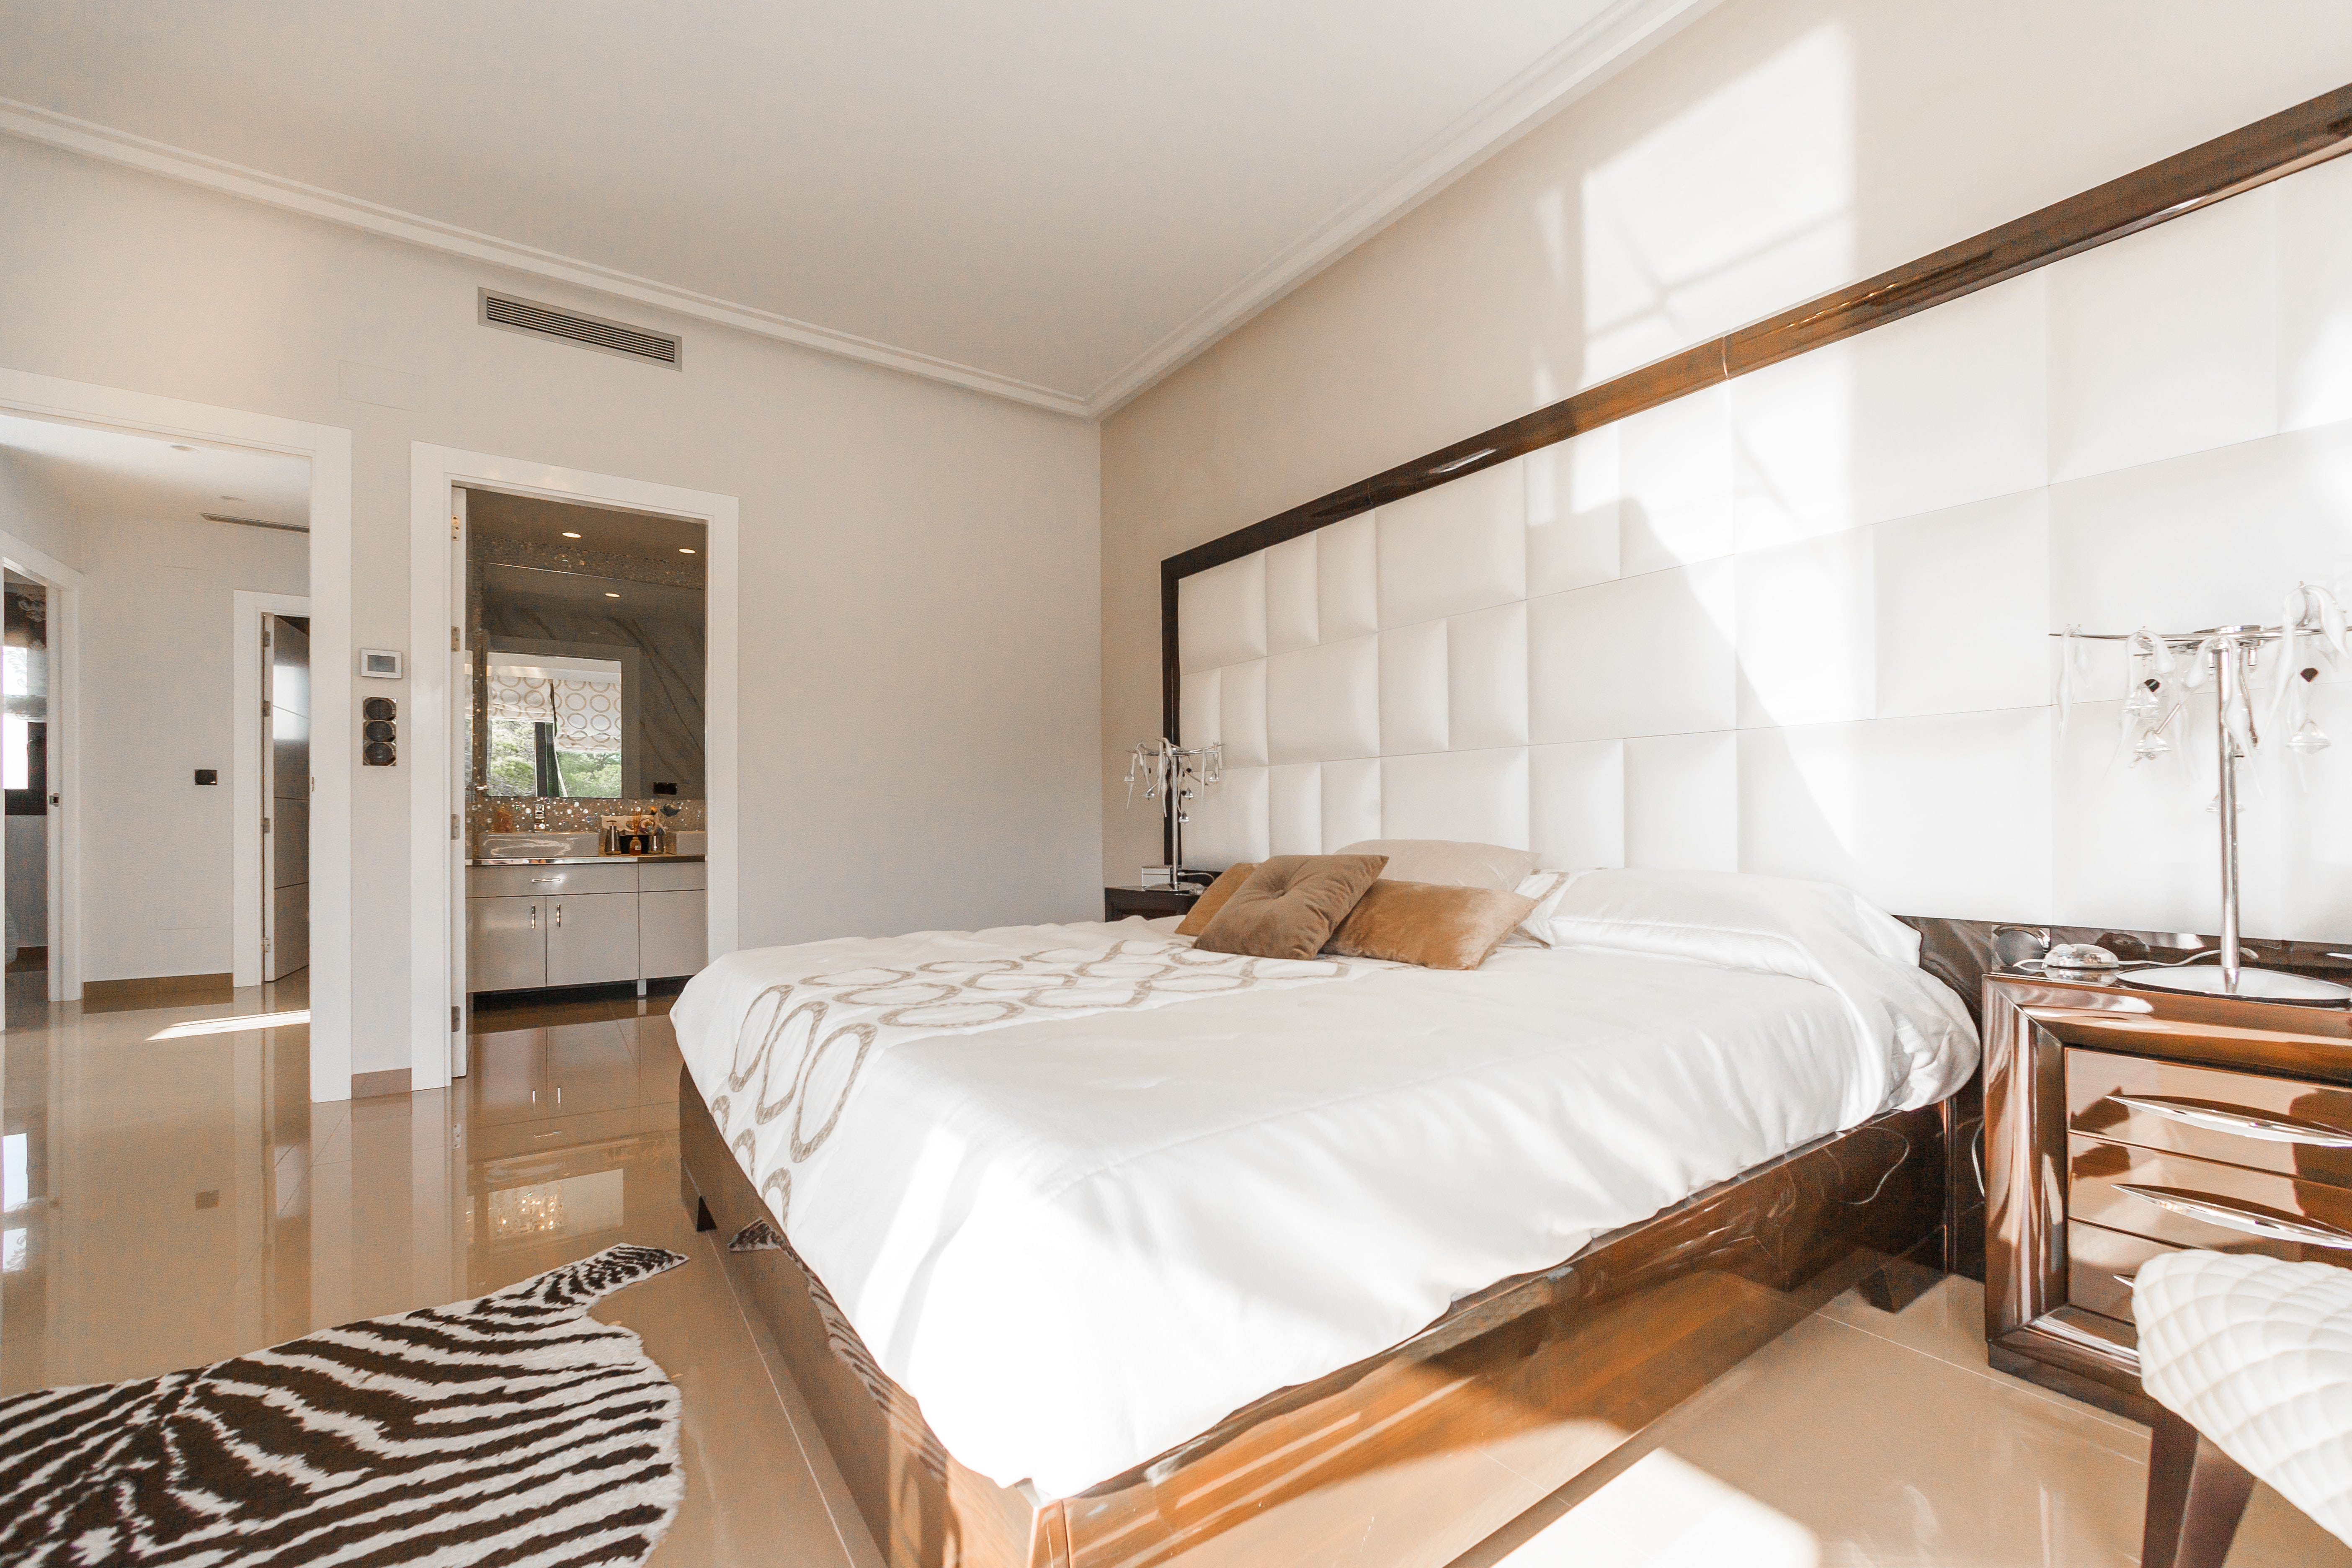 Rentals | 20 Best Free Rental, Interior, Furniture, And Room Photos On  Unsplash